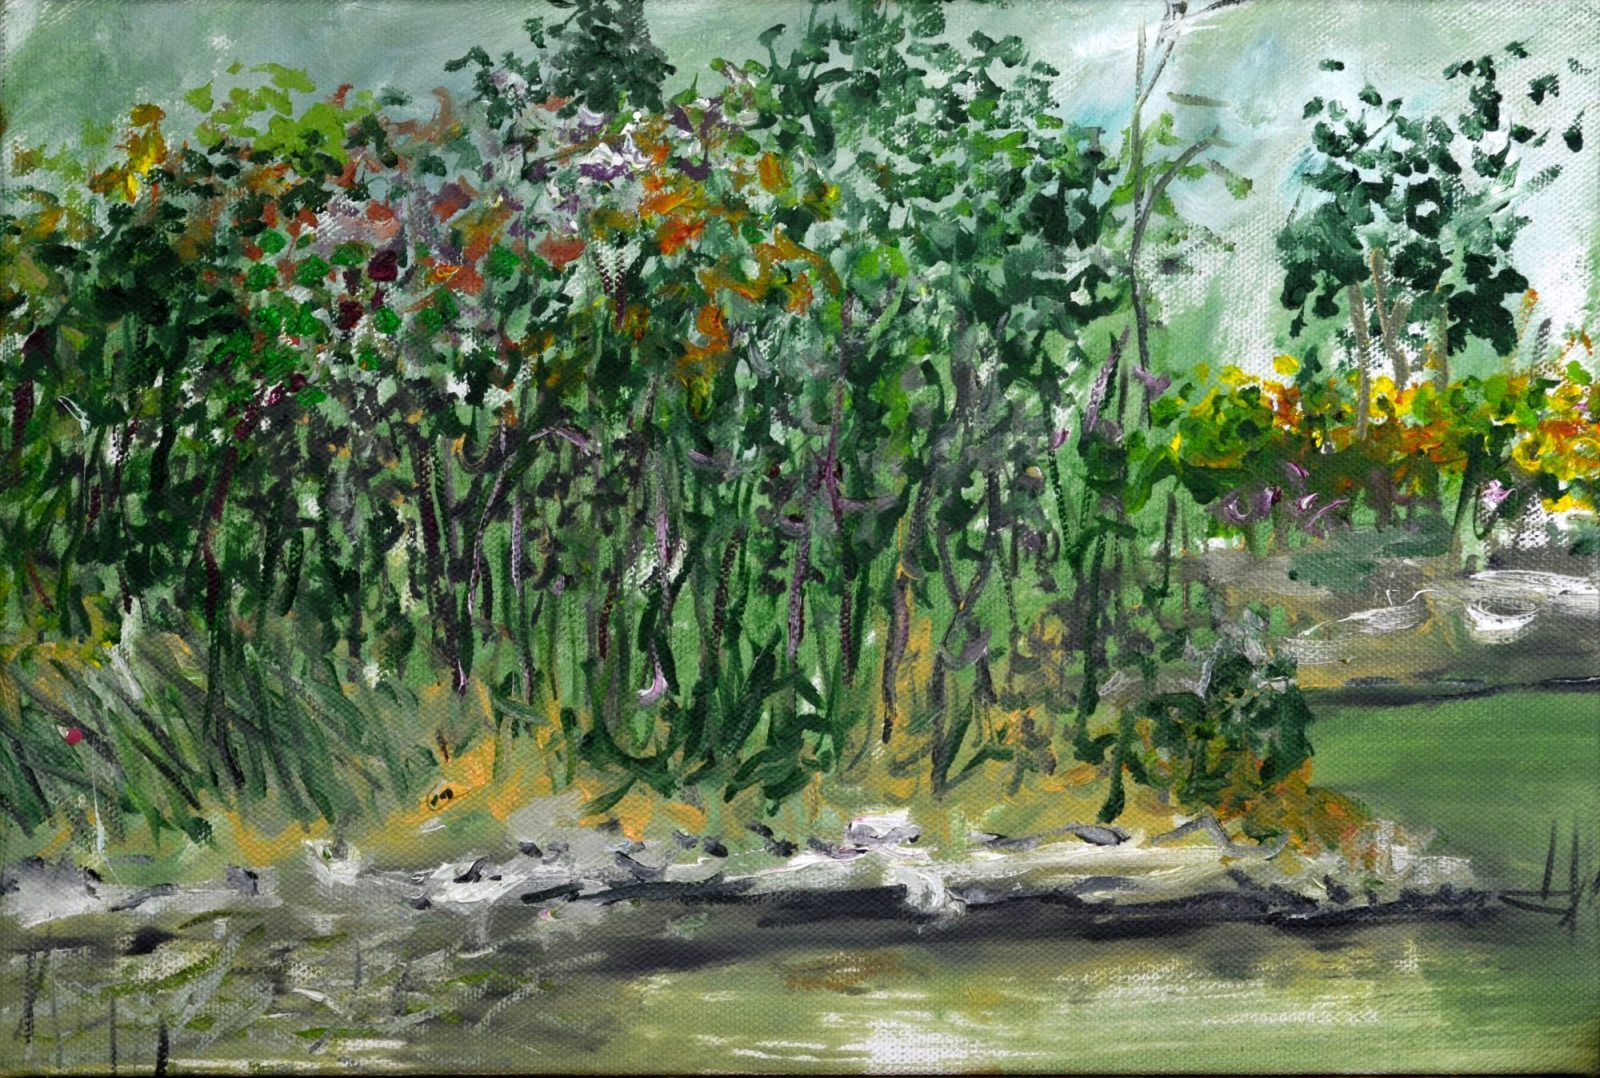 franyo aatoth: Garden Series 16.